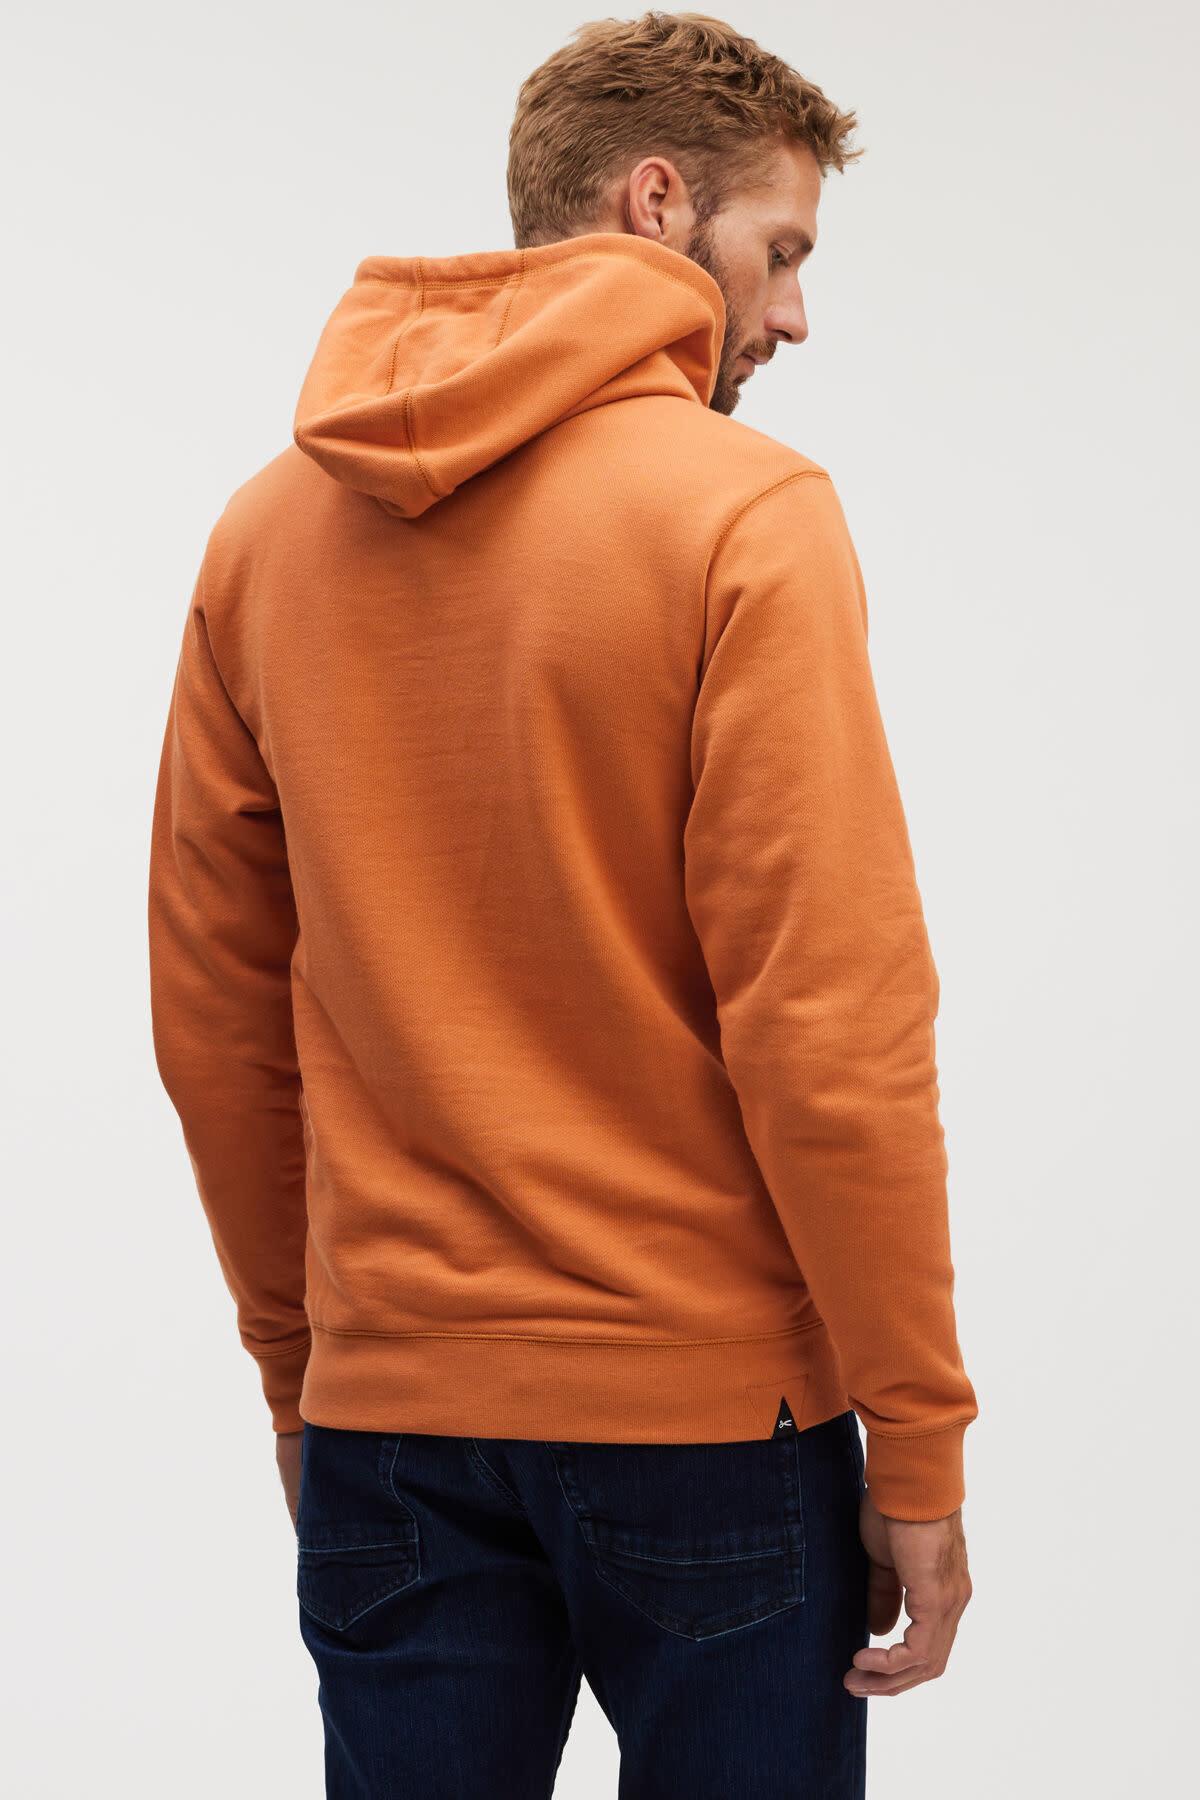 6 o clock  pocket Hoody orange-5